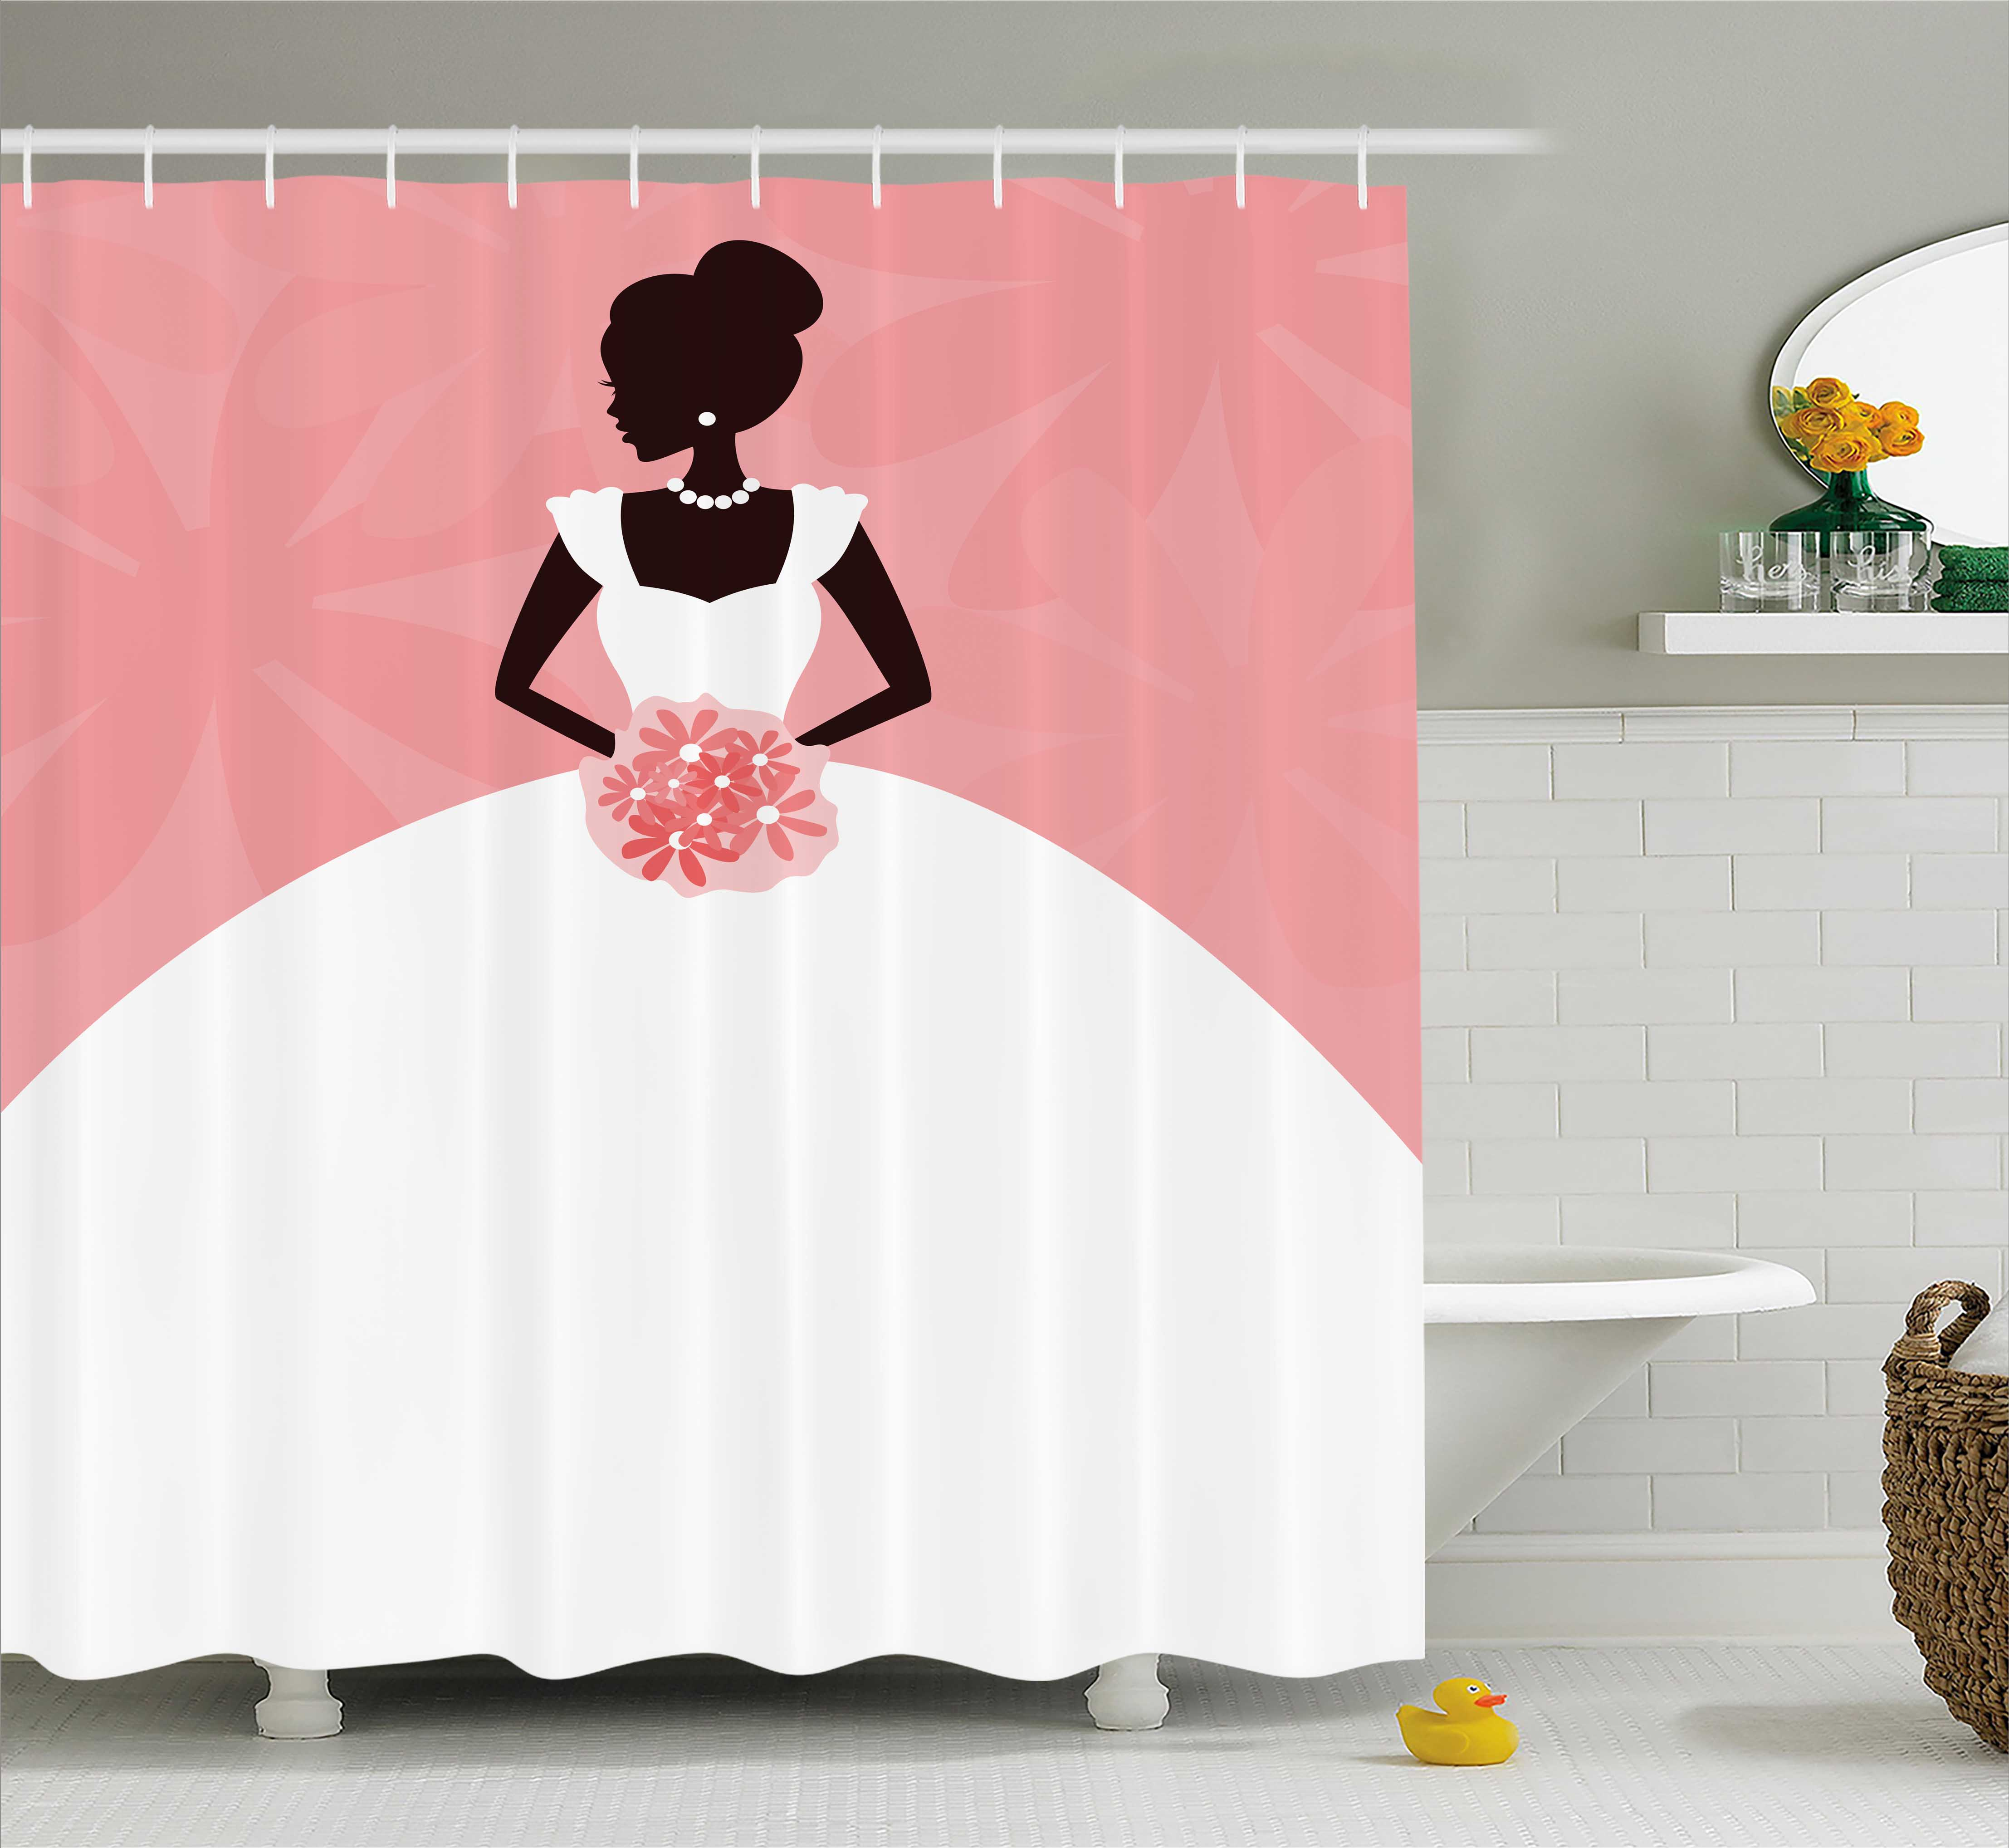 Bridal Shower Decorations Shower Curtain, Wedding Dress w...